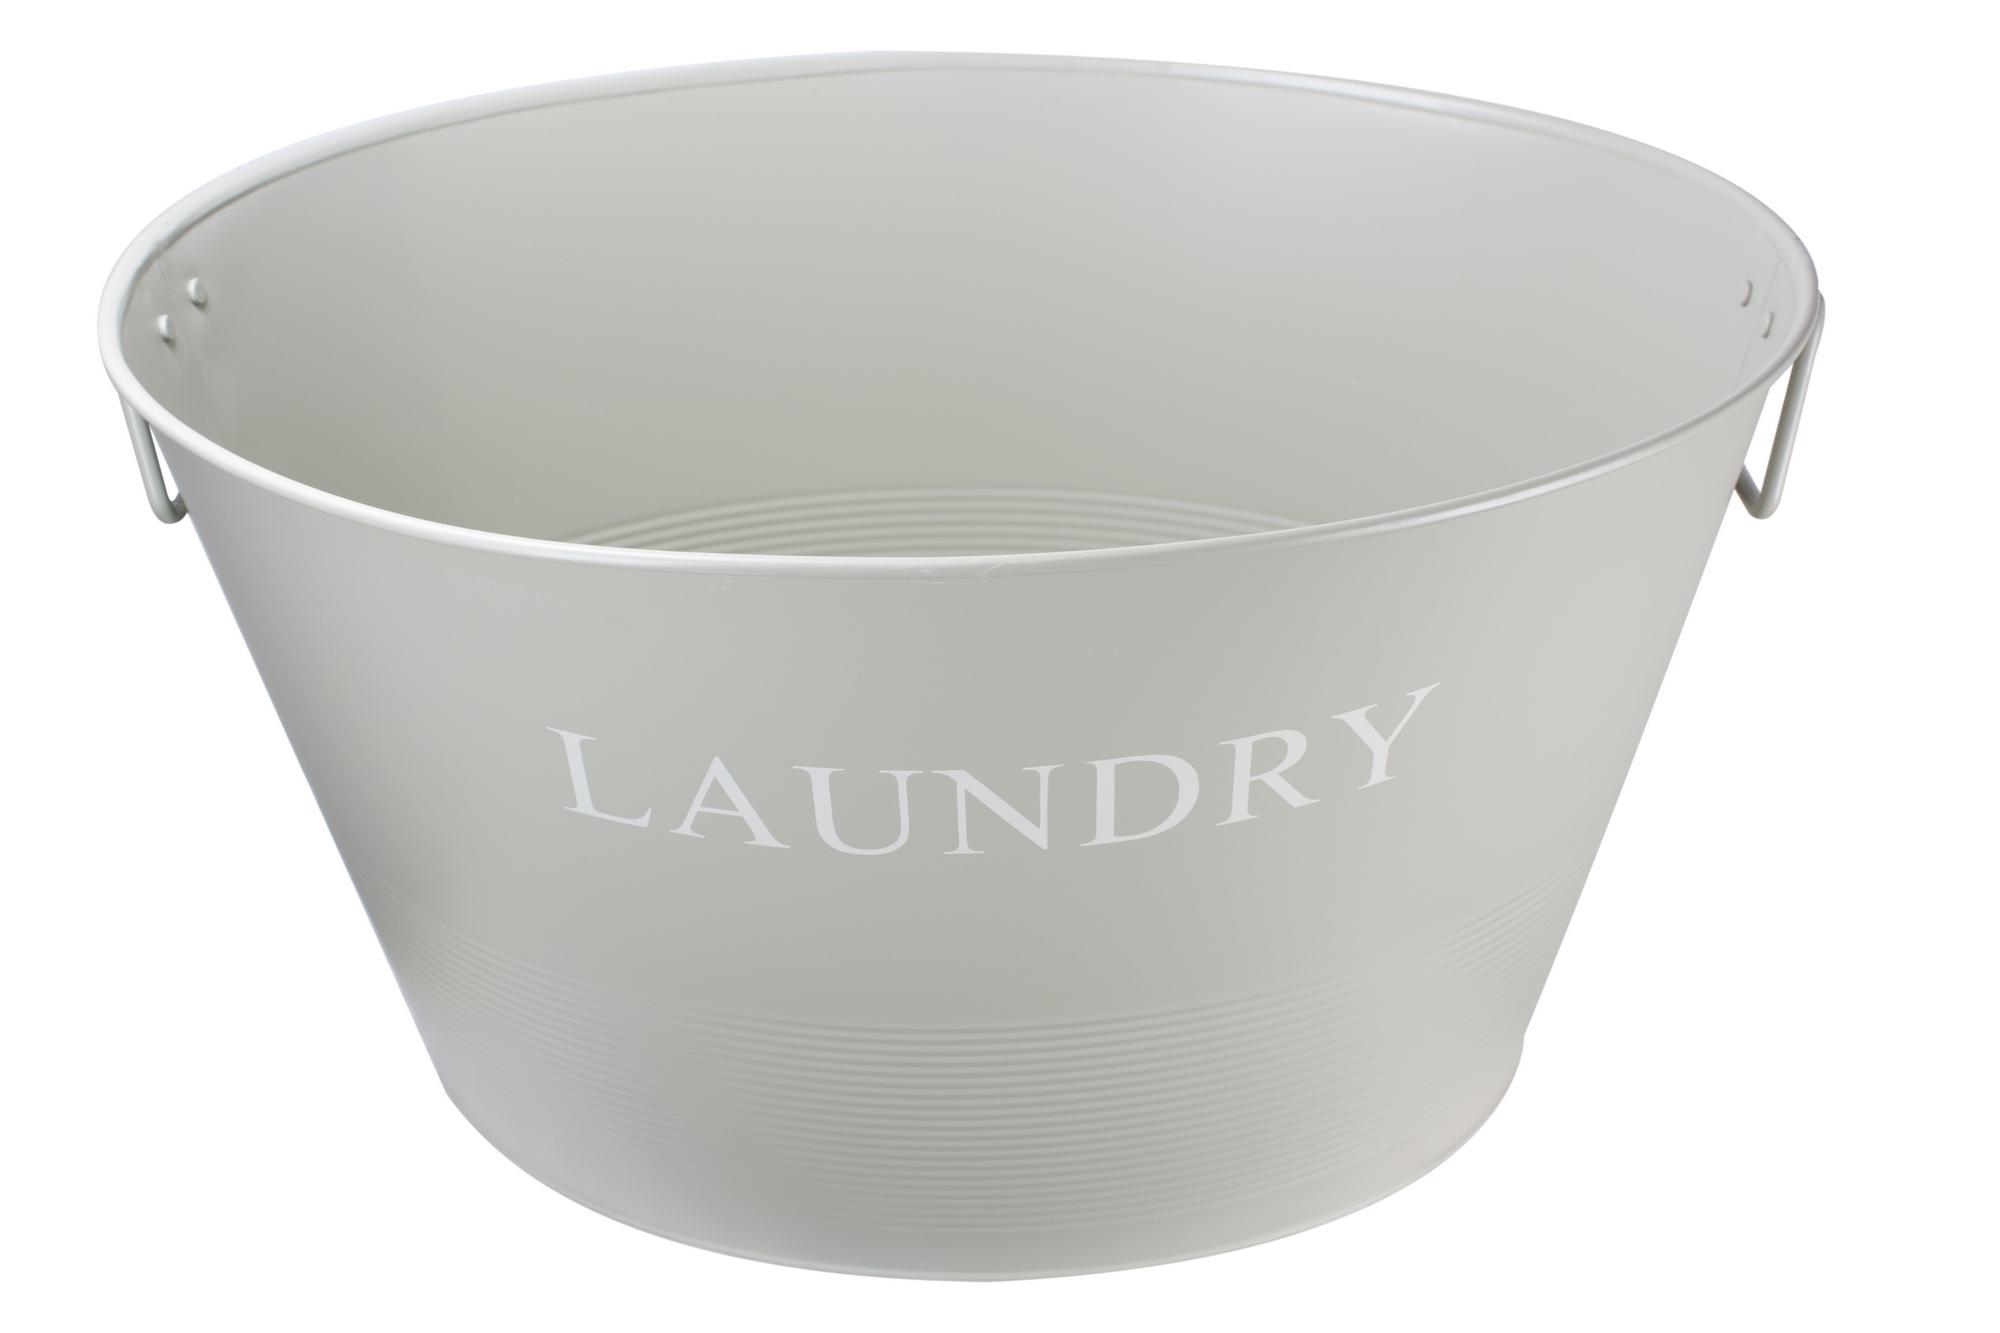 Metal Laundry Tub : Traditional Metal Laundry Washing Basket Tub Carrier Handles French ...